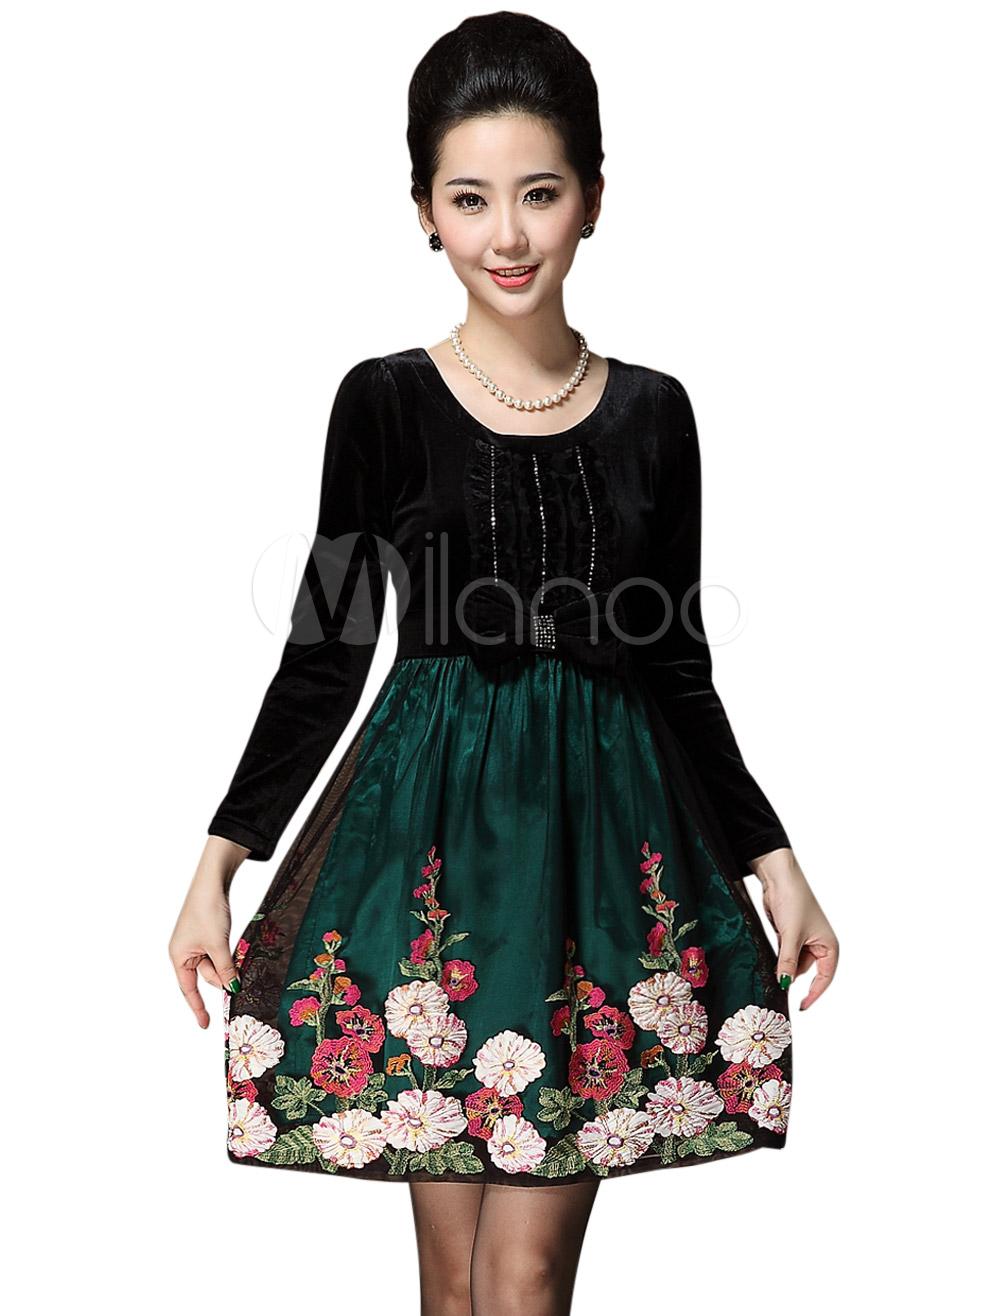 Milanoo ltd vintage dresses attractive long sleeves floral